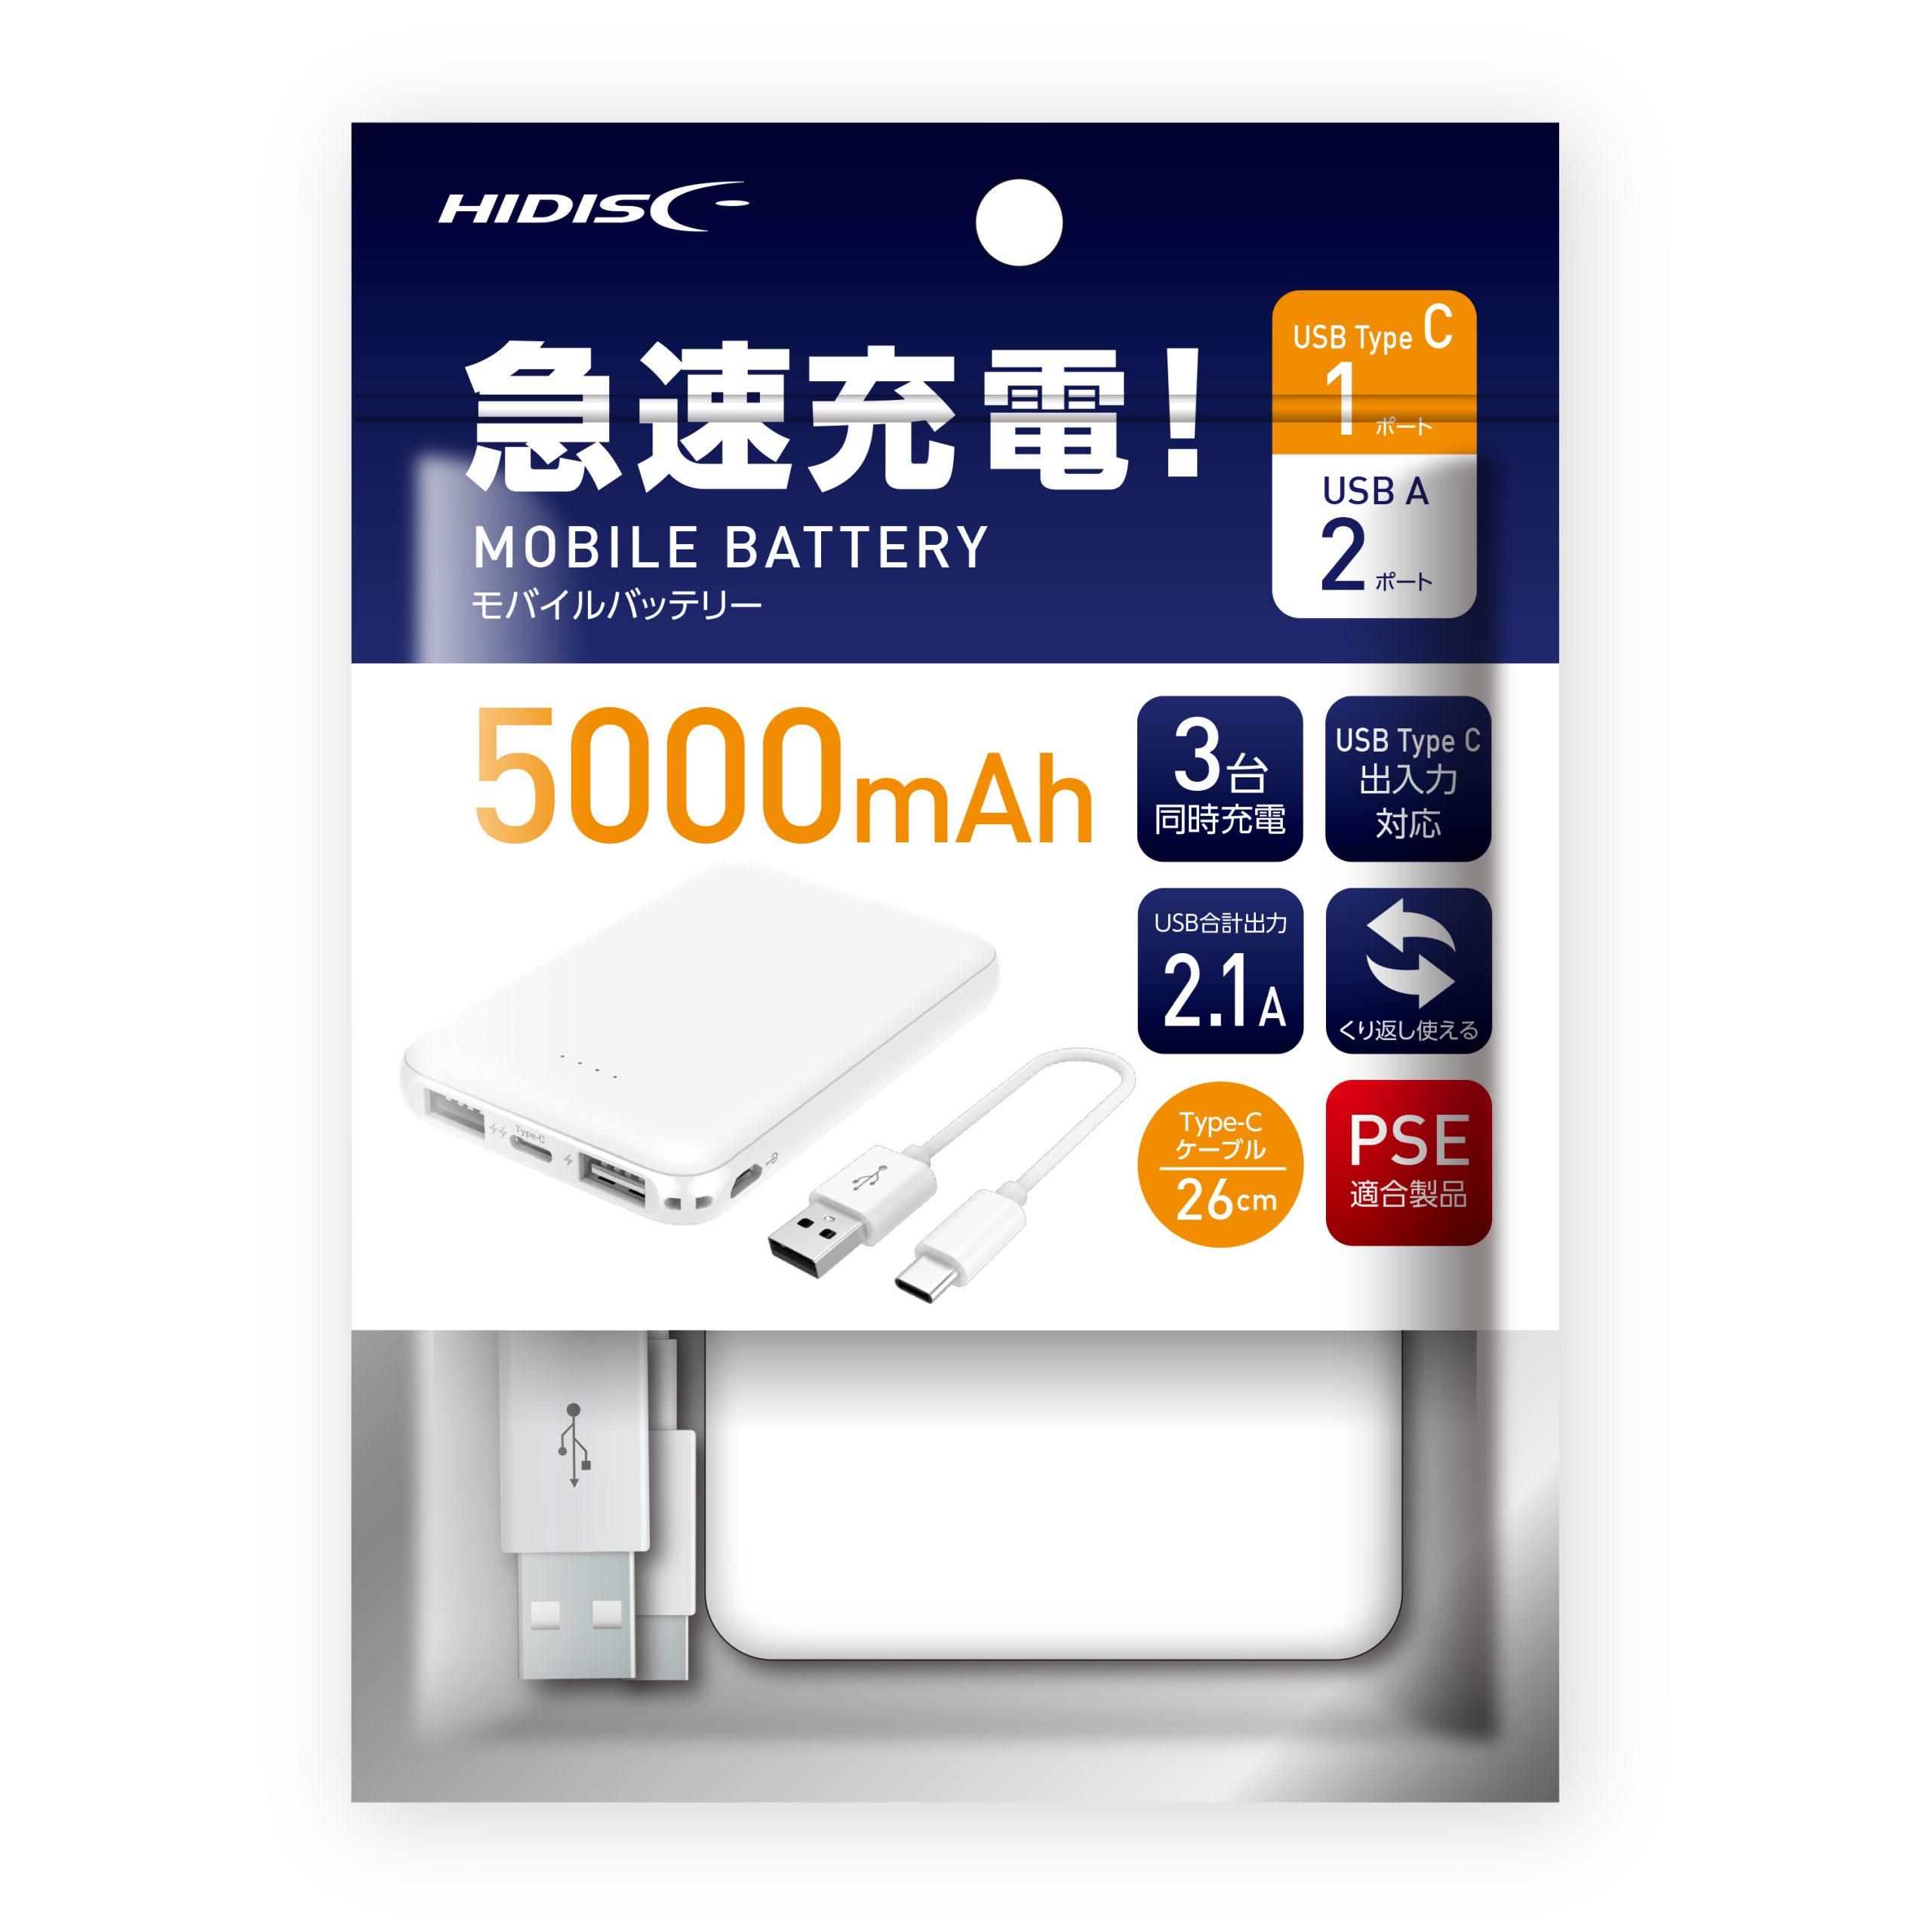 HIDISC OPP包装 Type-C入出力対応モバイルバッテリー5000mAh